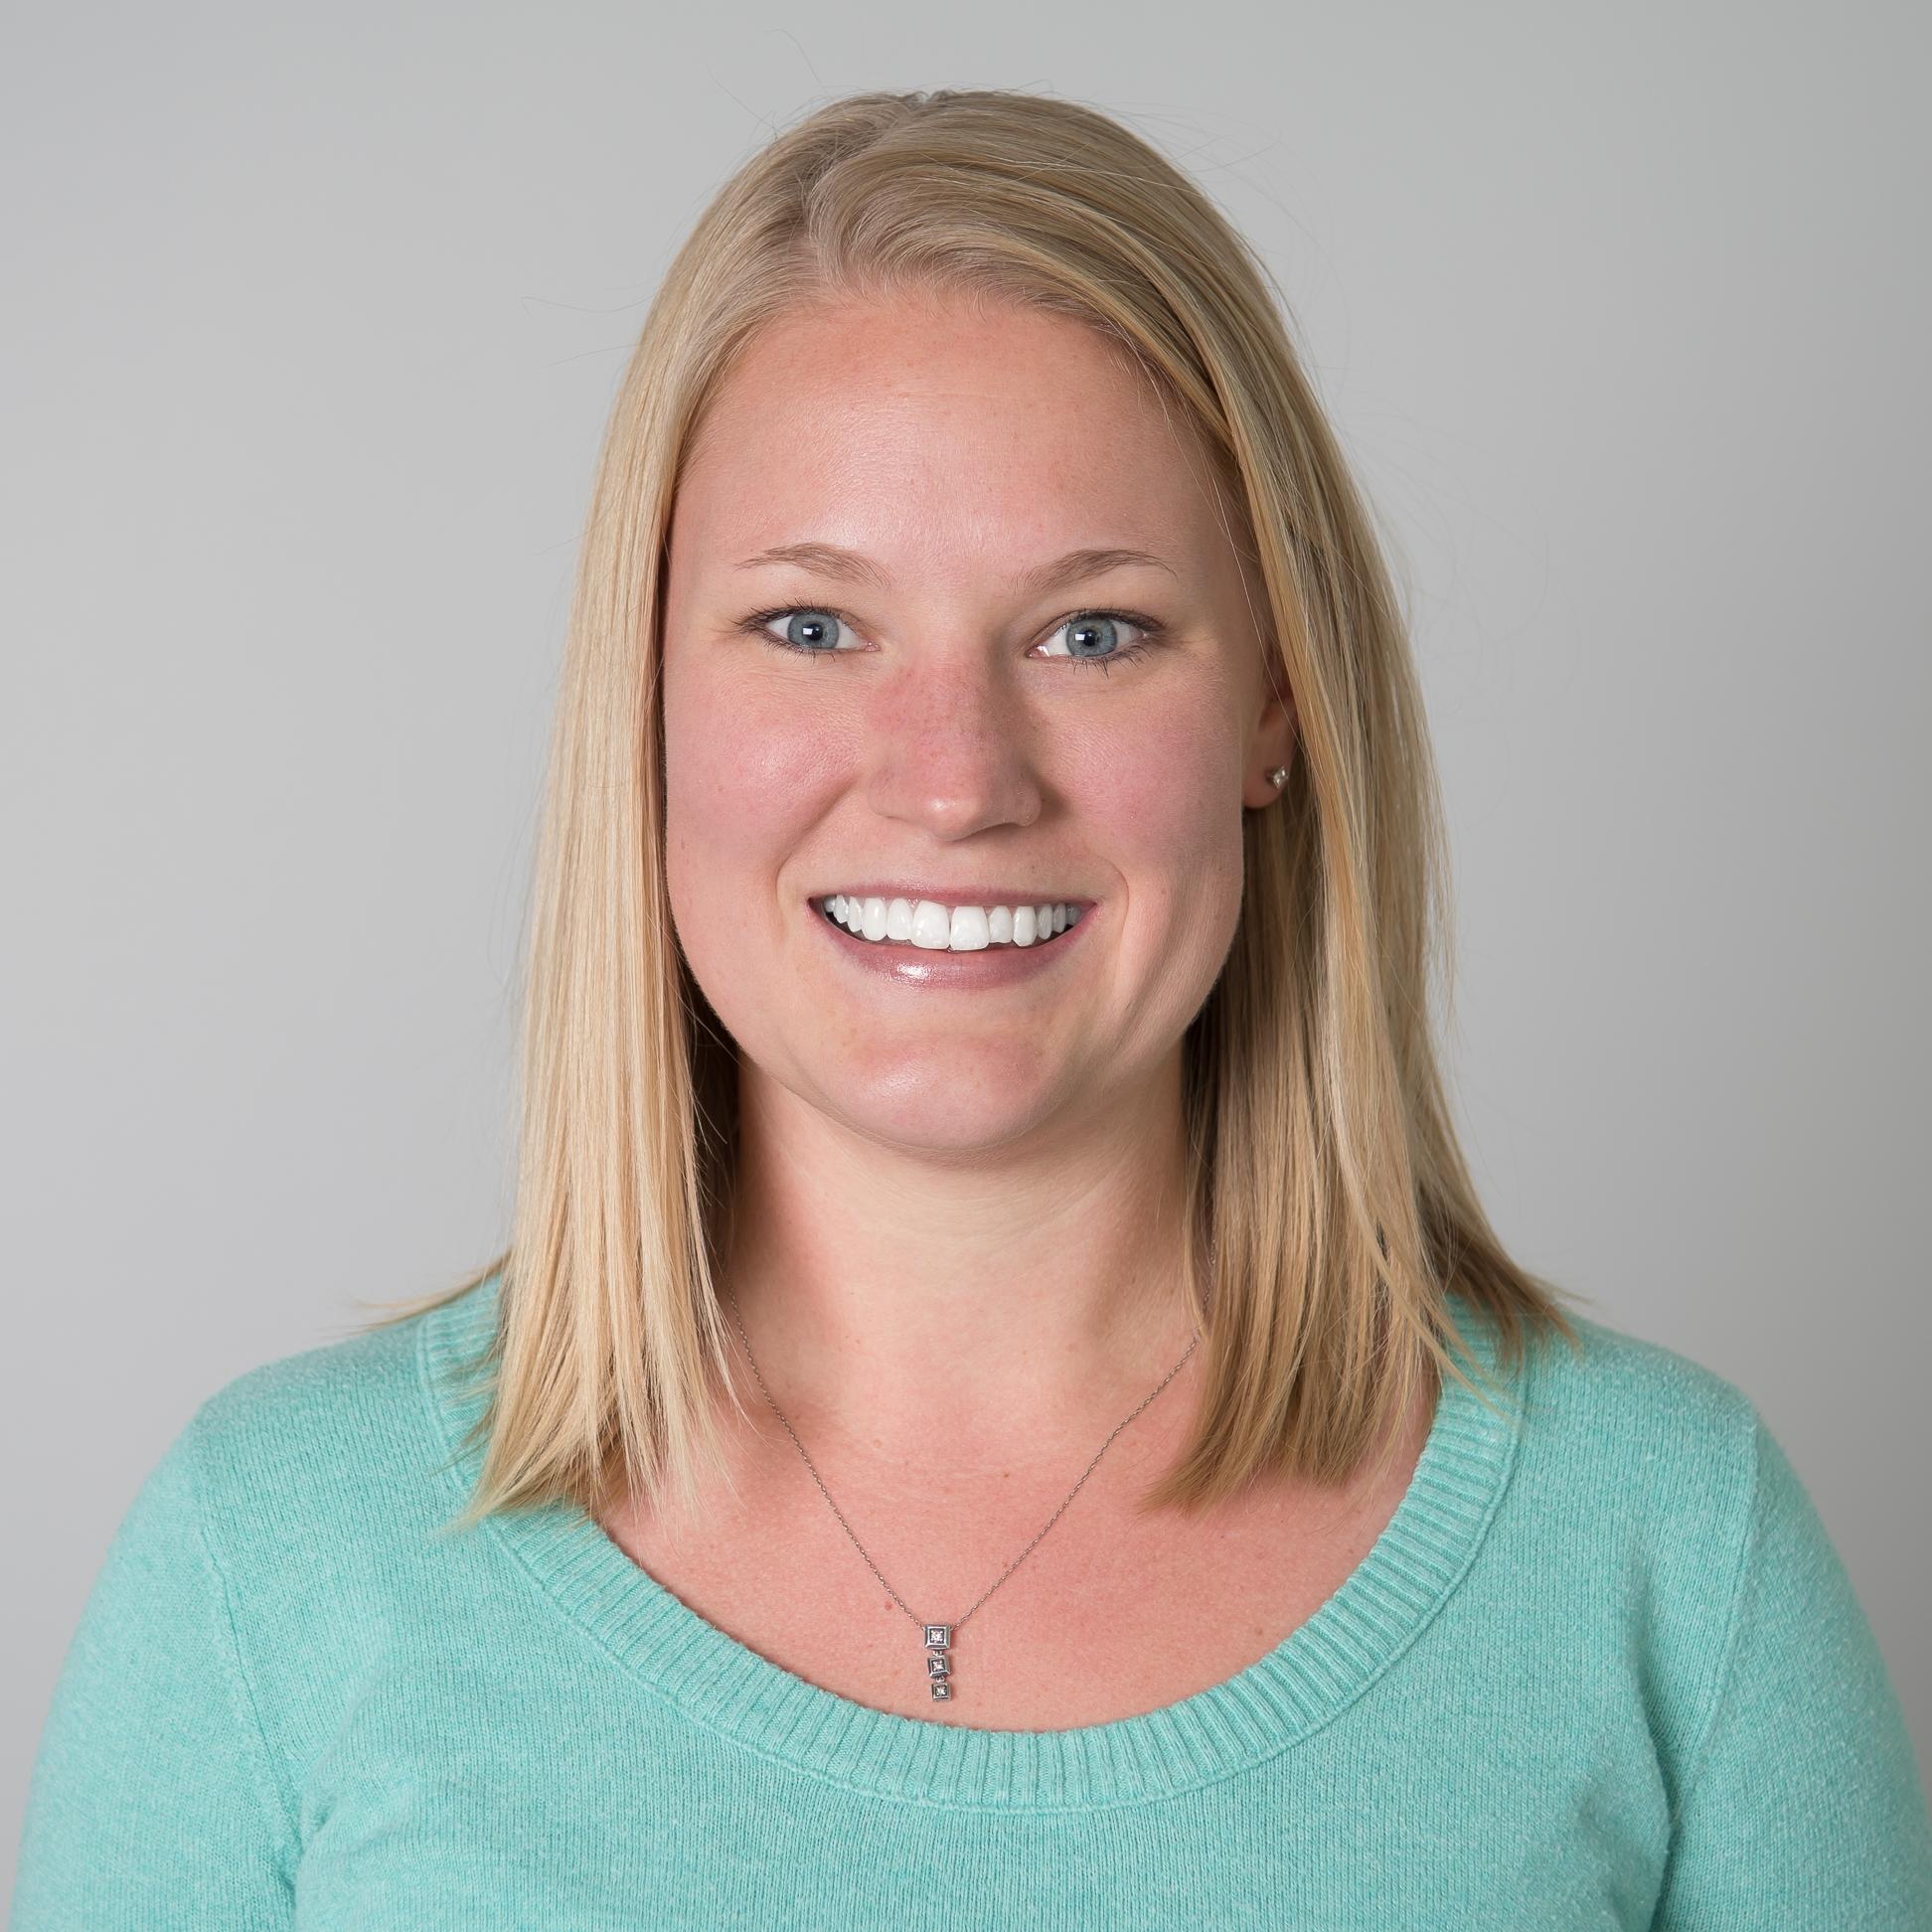 Katie Curtis - Office Managerkatie@medconnectpro.com(503) 922-2160 ext. 304(971) 205-7240 (direct)